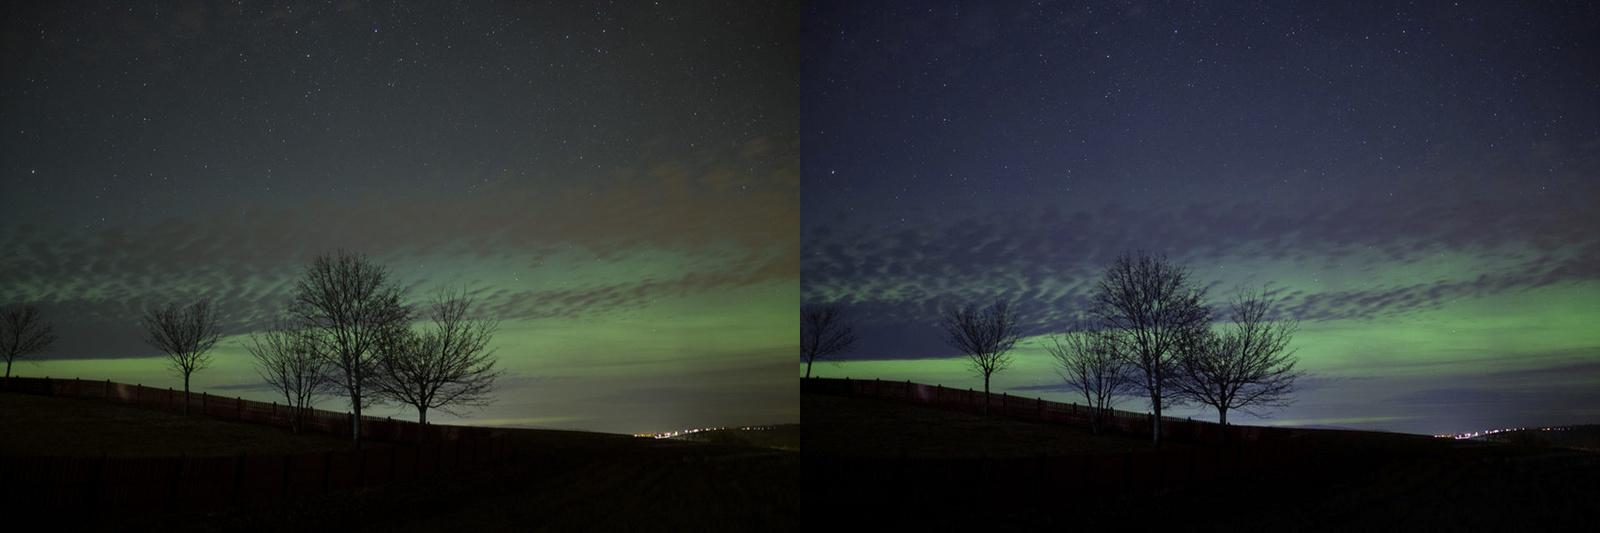 Redhancer_aurora_link.thumb.jpg.fbe4cec36b7005dcbf3e998e6f6dc55e.jpg